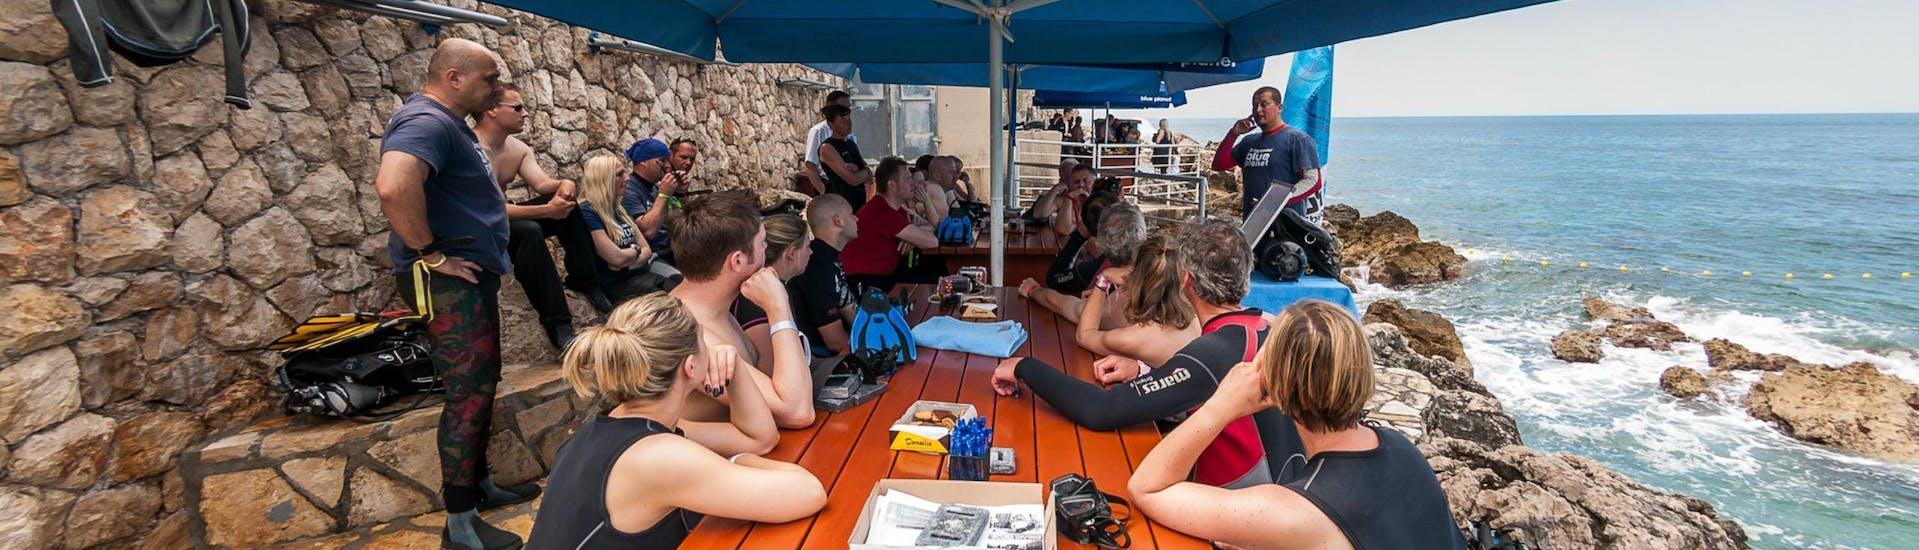 scuba-diving-course-for-beginners---padi-discover-scuba-diving-dubrovnik-blue-planet-diving-center-hero